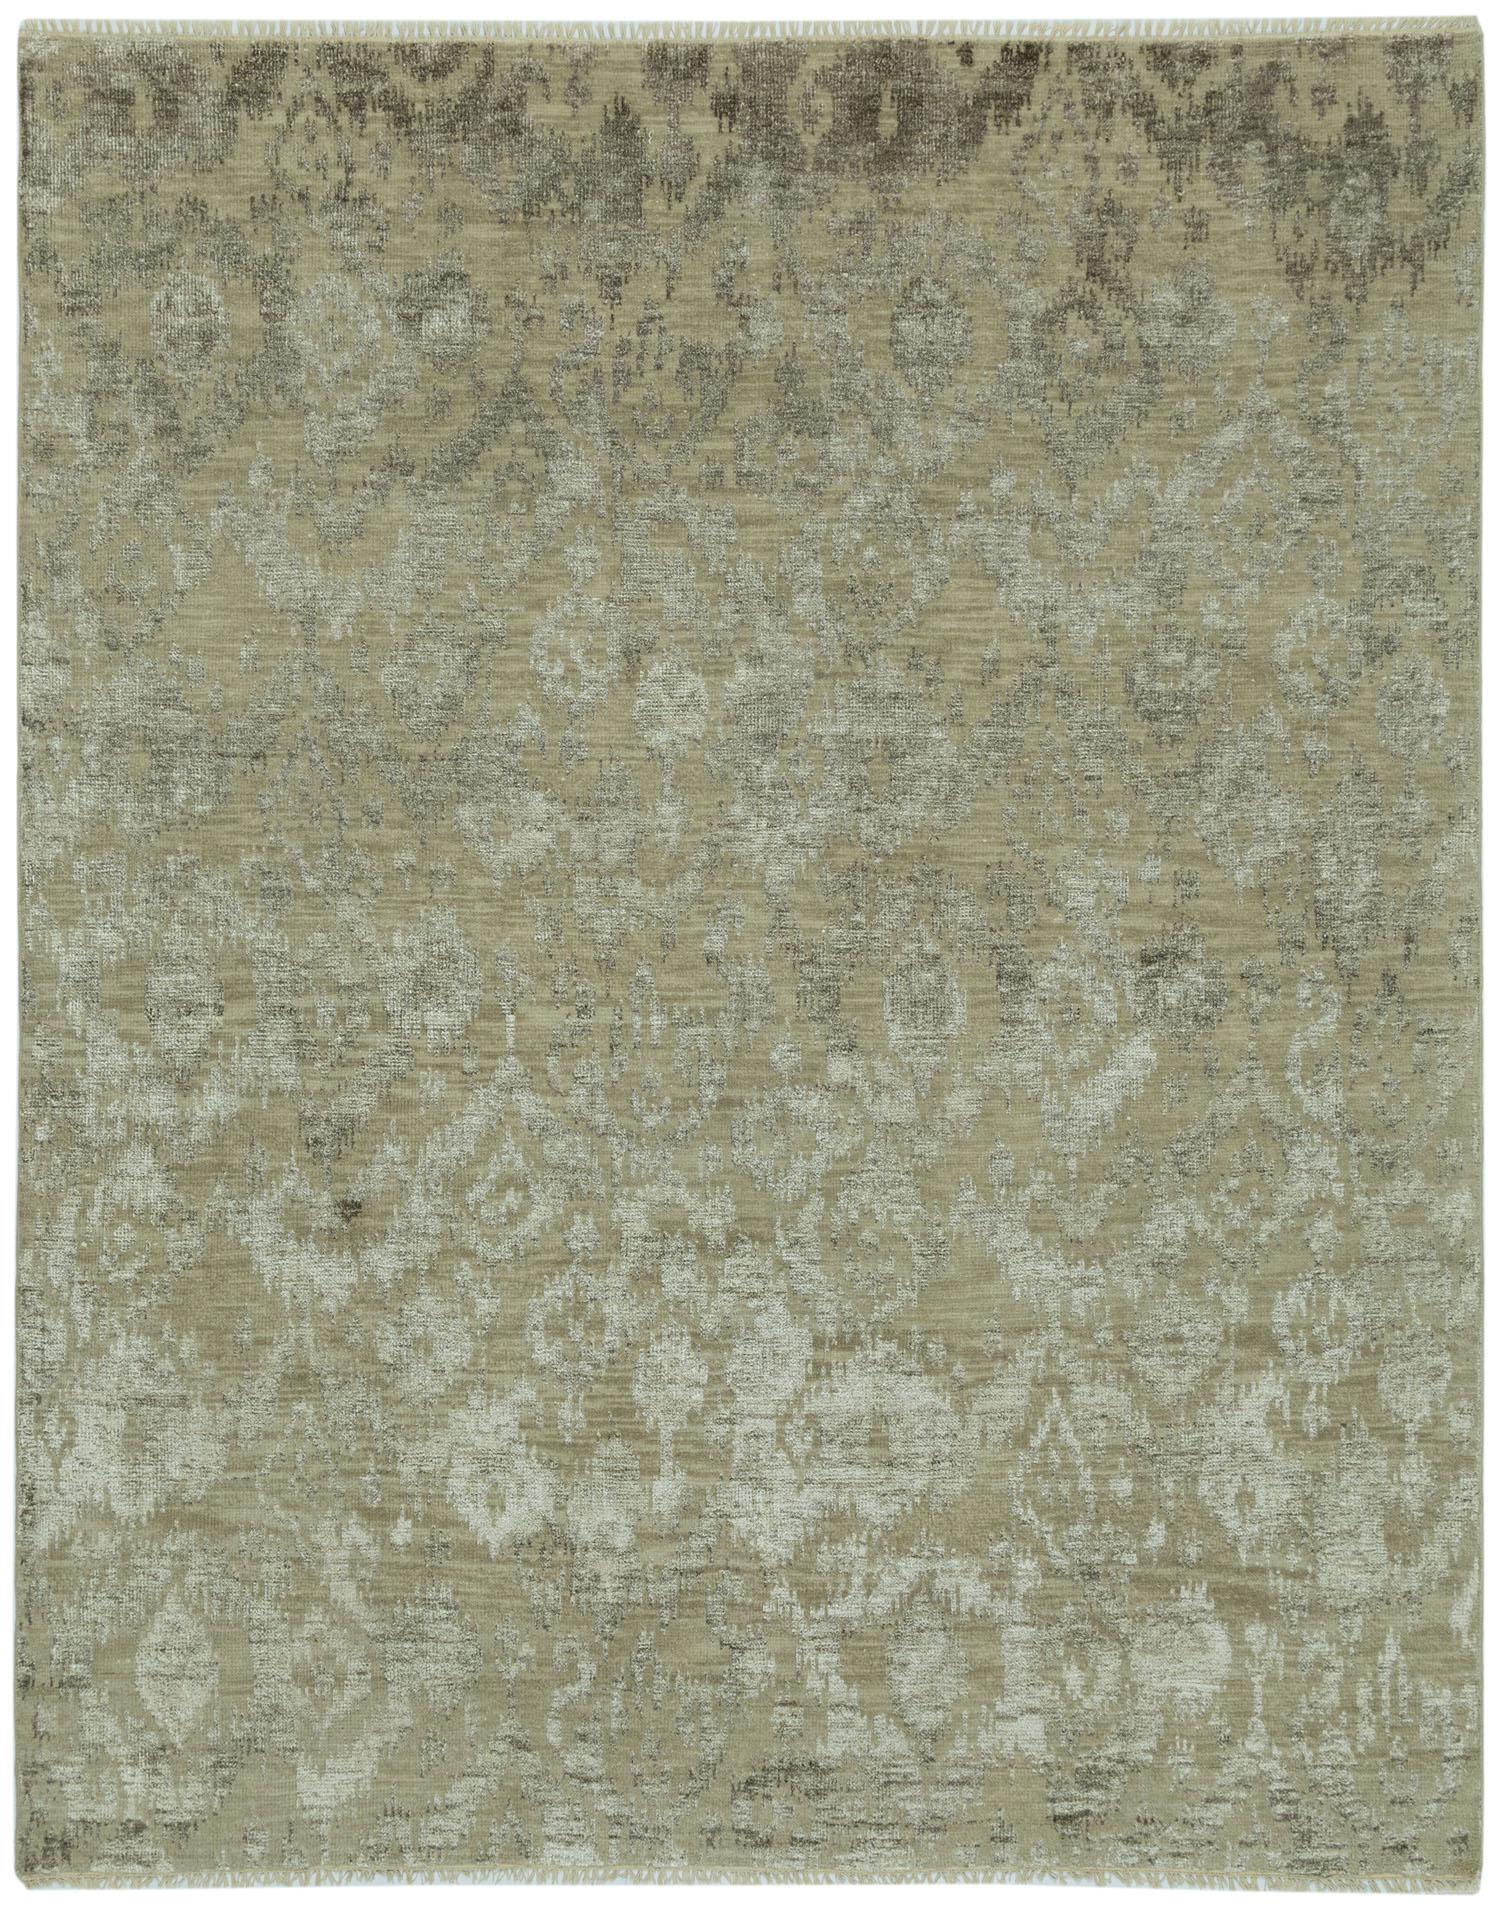 Gold recycled wool + silk.jpg